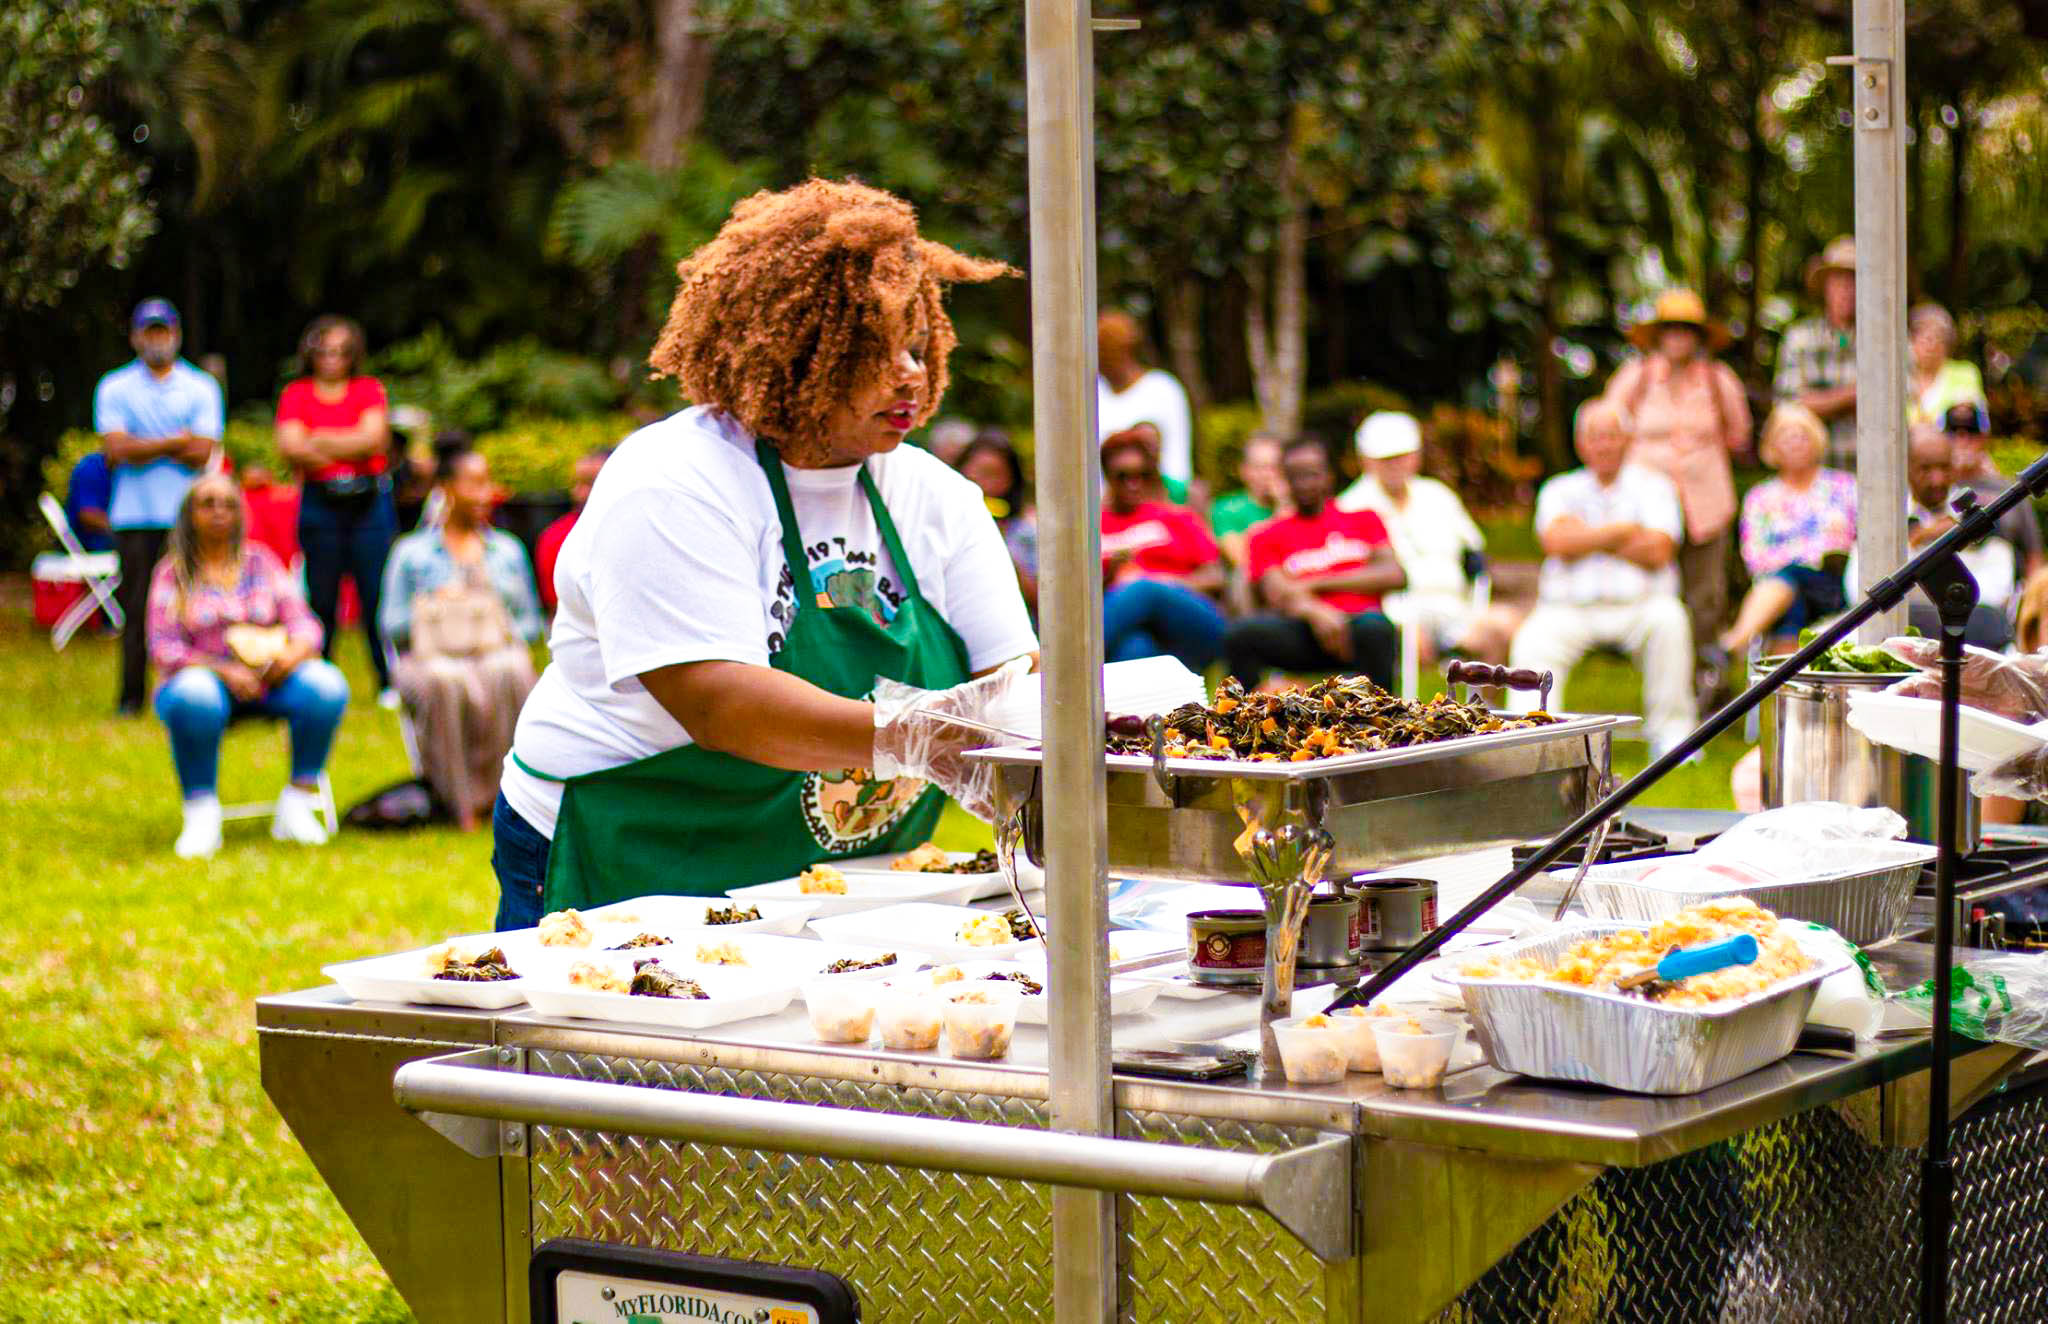 Tampa Bay Collard Green Festival celebrates how food creates relationships